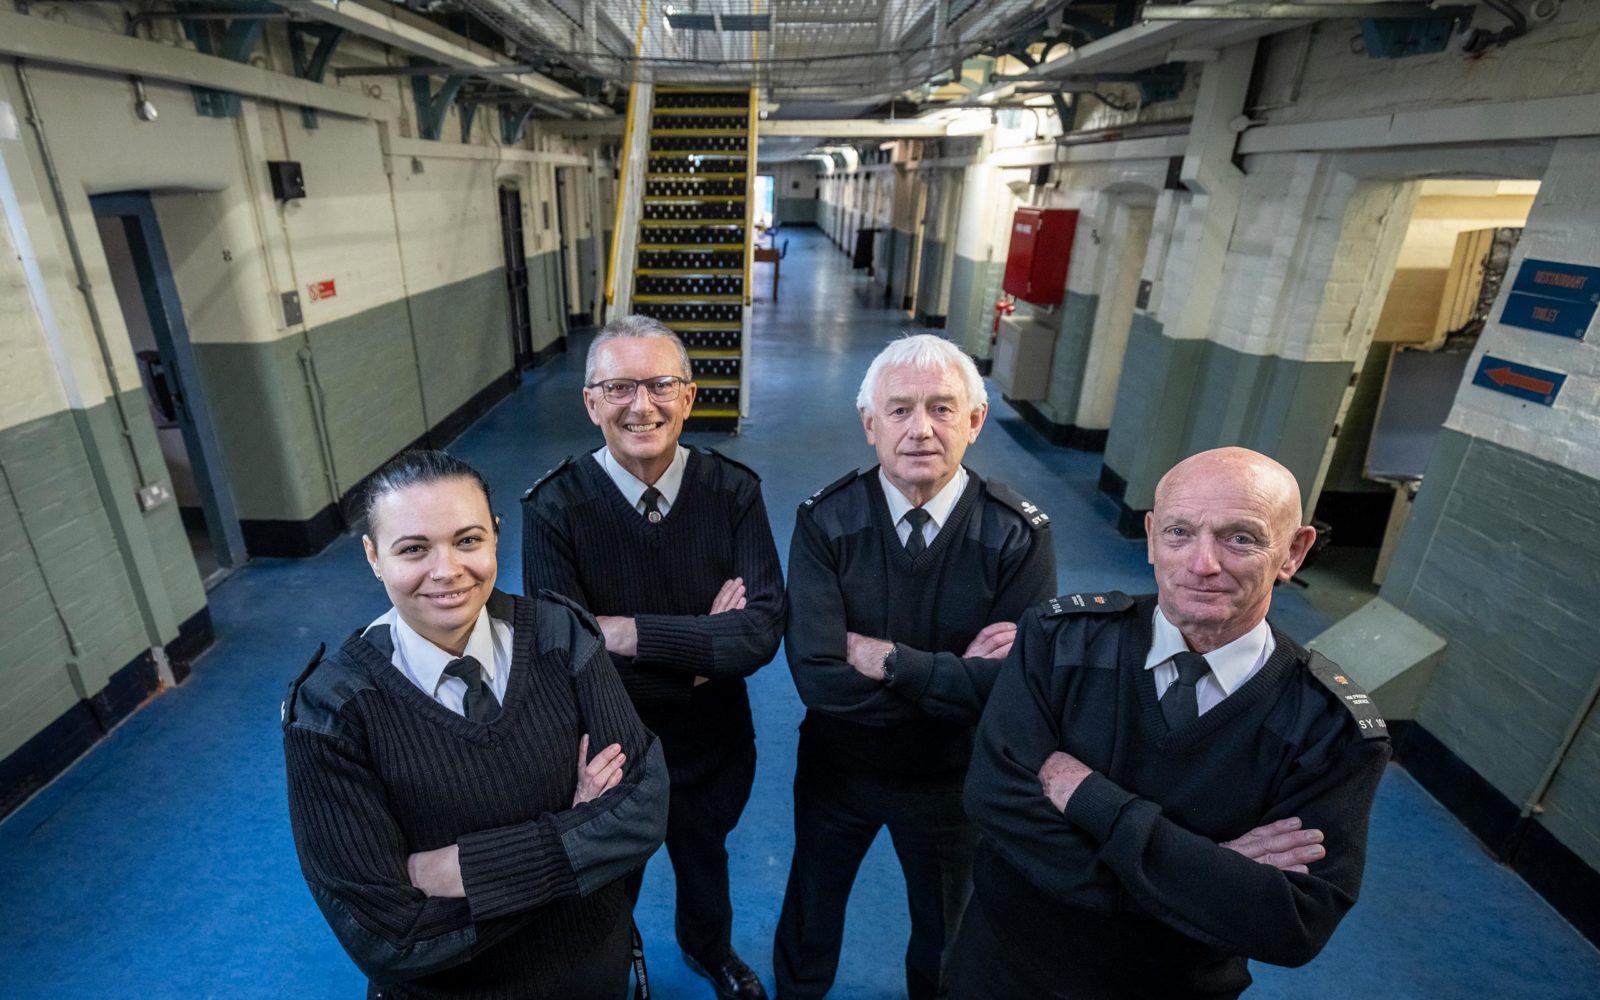 Shrewsbury Prison Private Tours